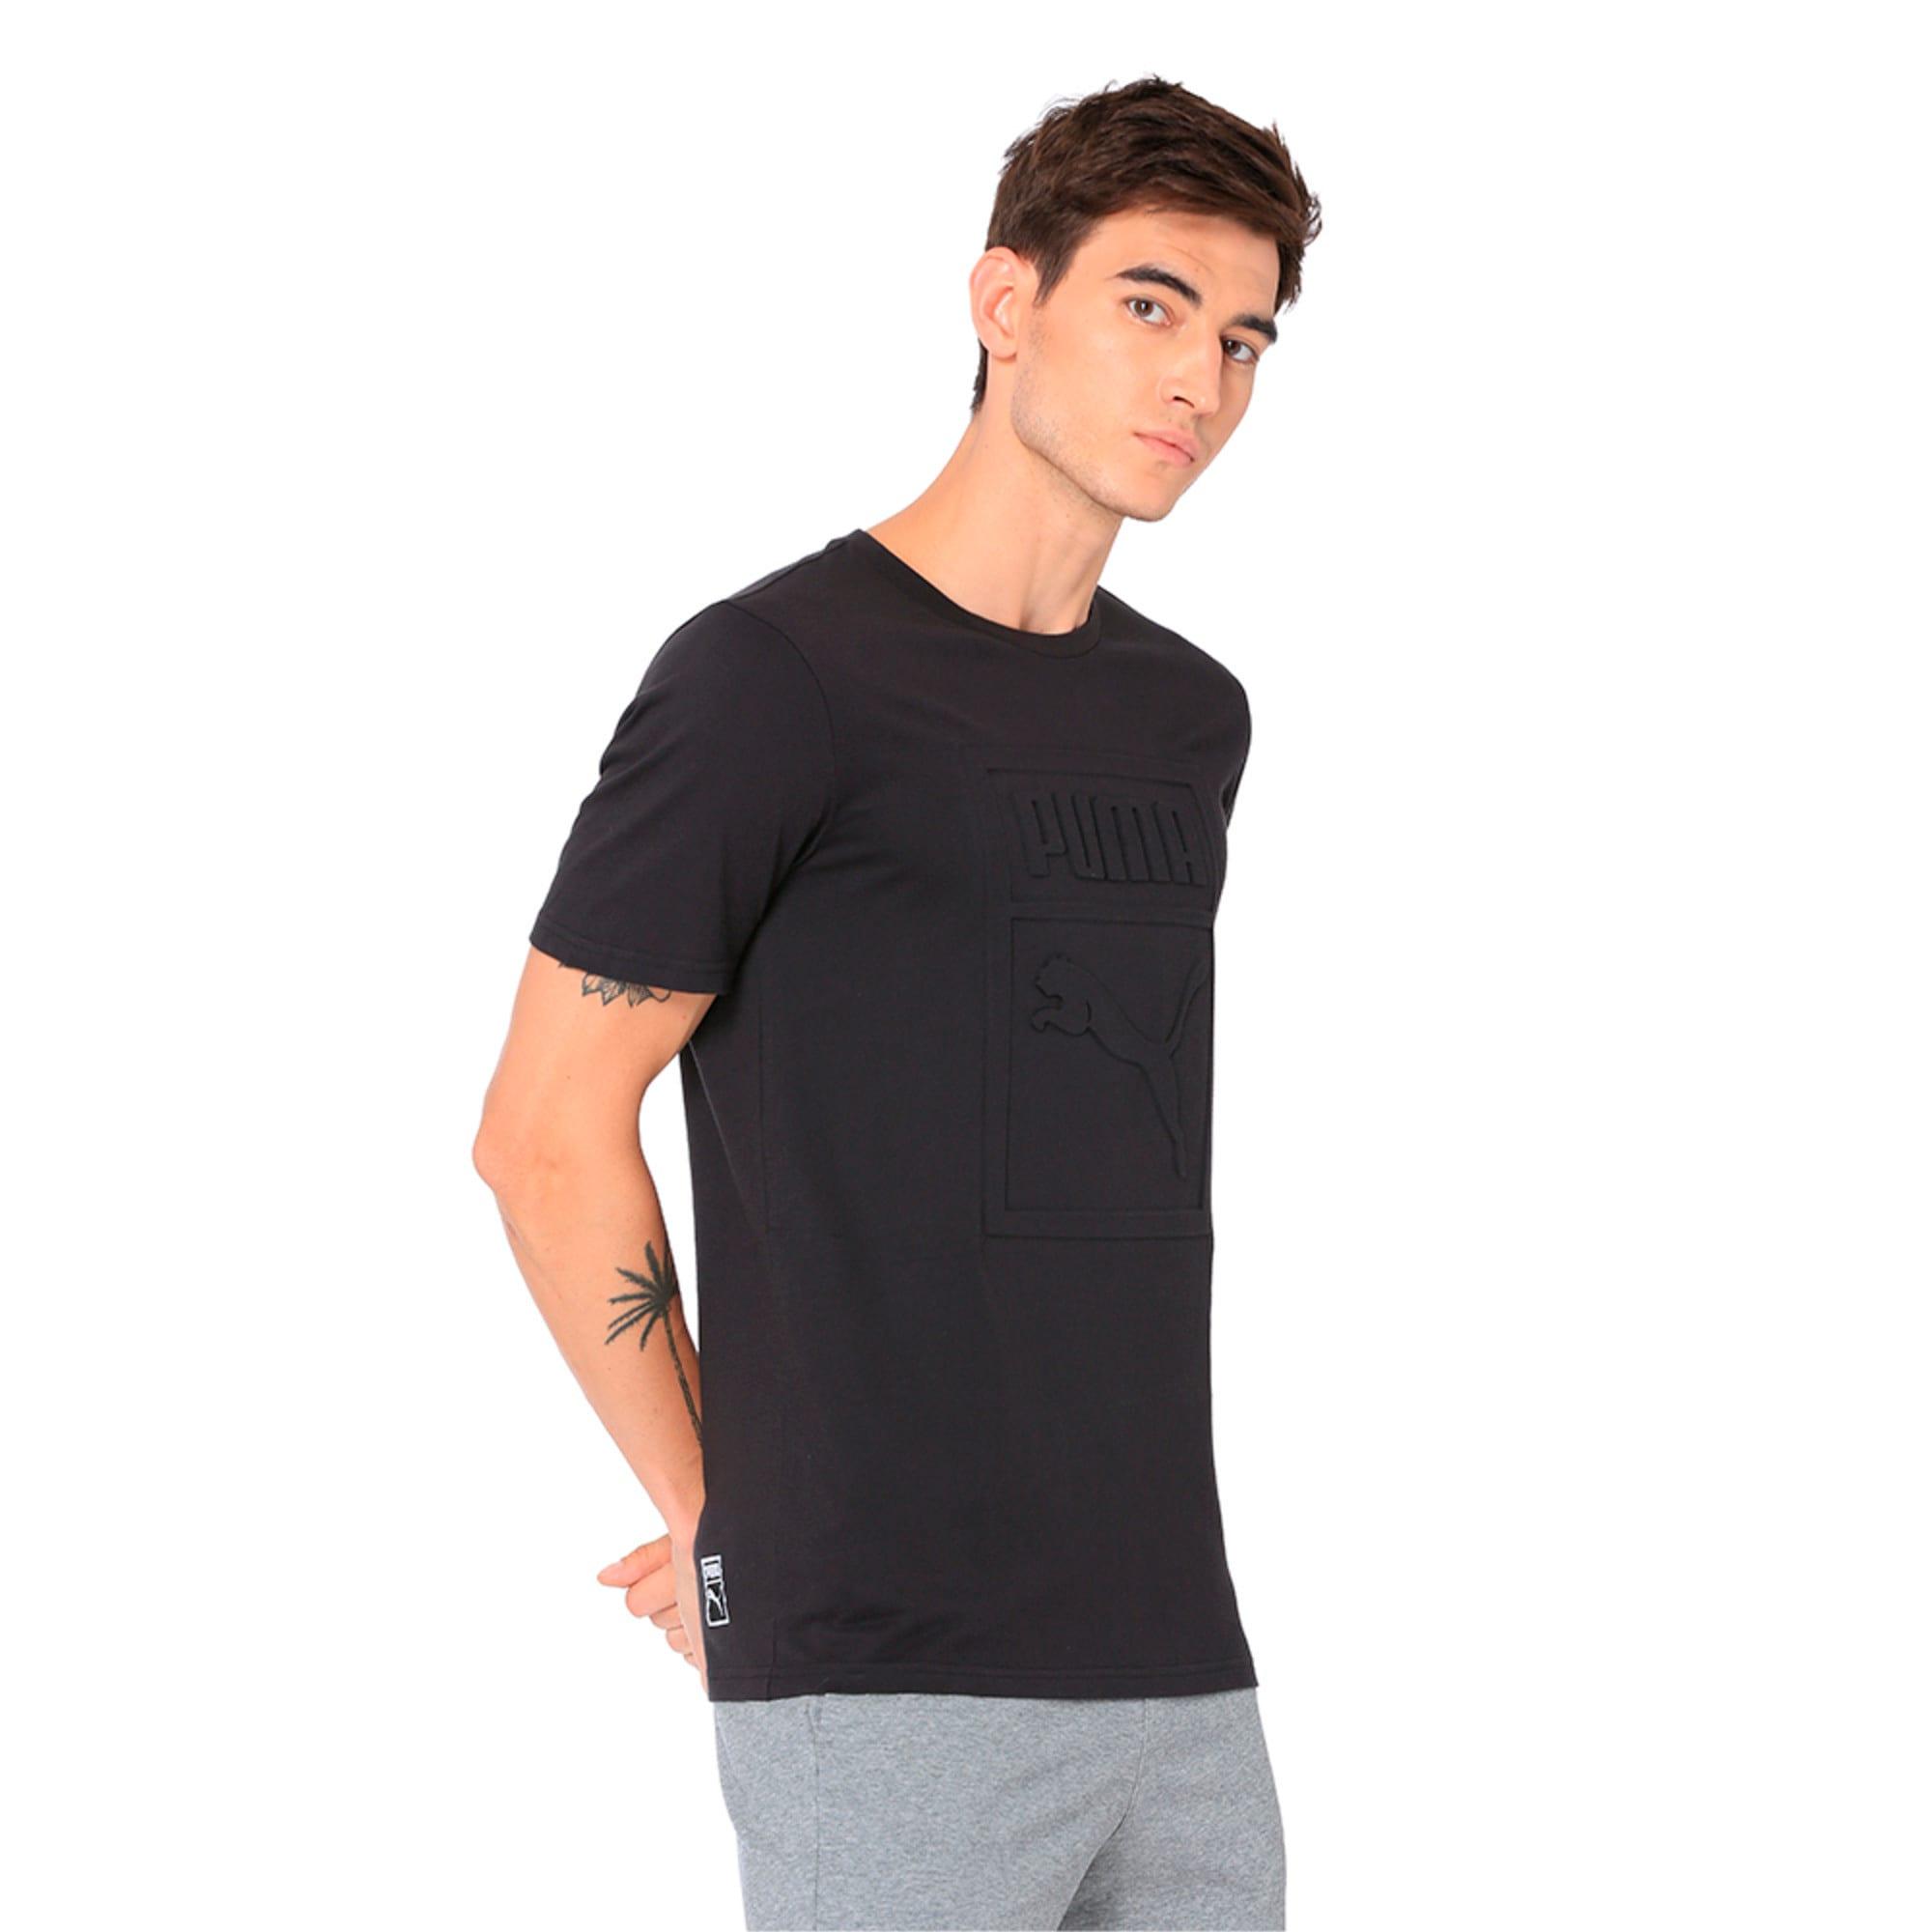 Thumbnail 2 of Classics Men's Archive Embossed Logo T-Shirt, Puma Black, medium-IND